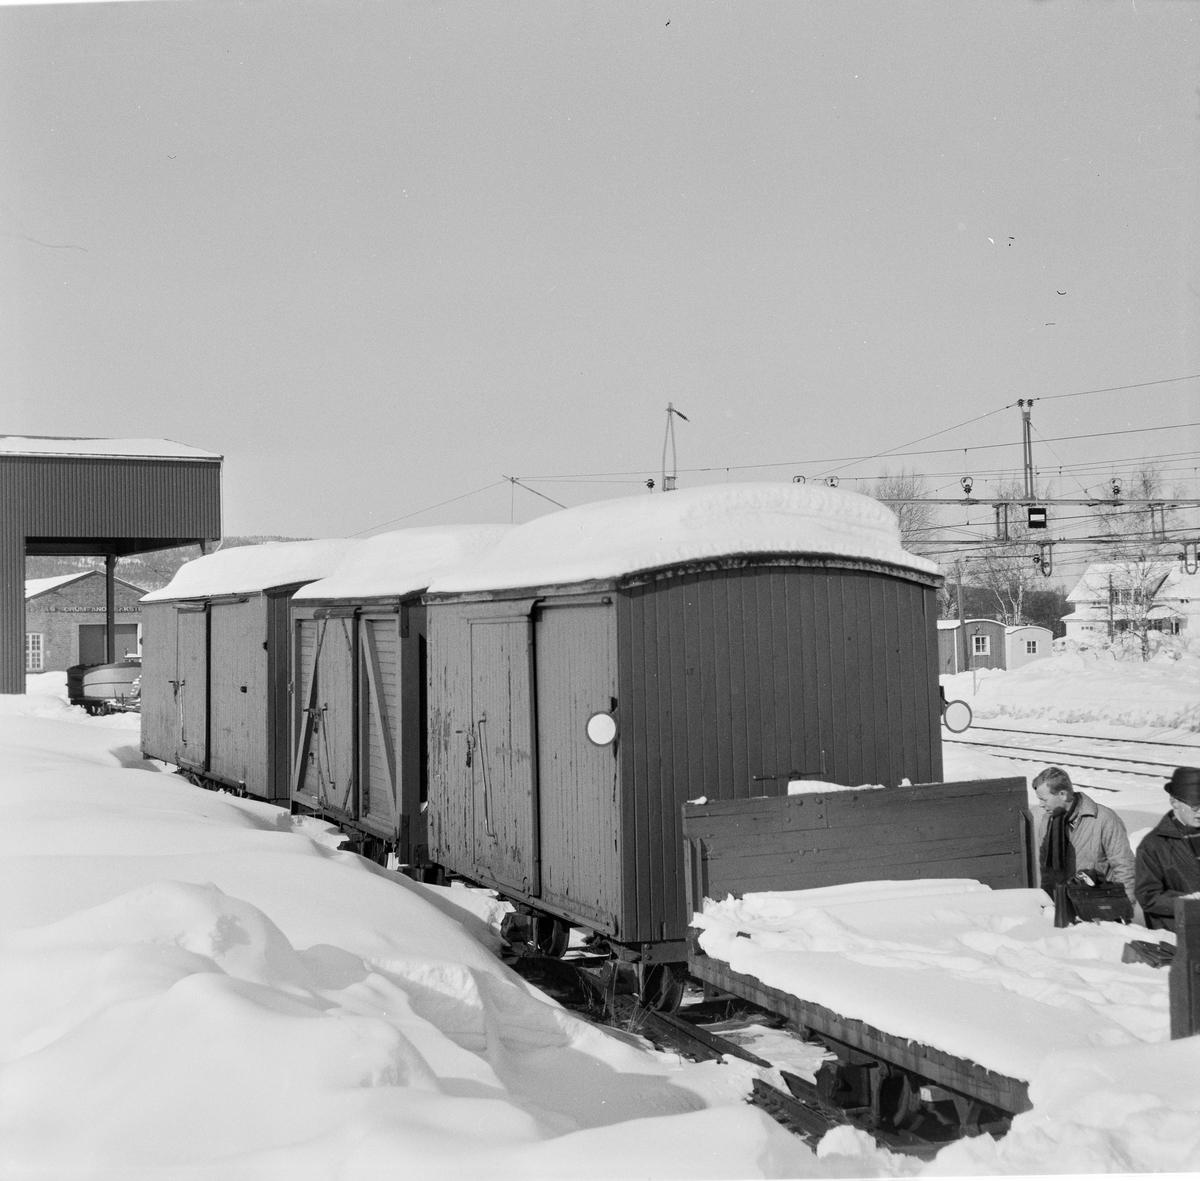 Hensatte godsvogner på Sørumsand Verksteds område.